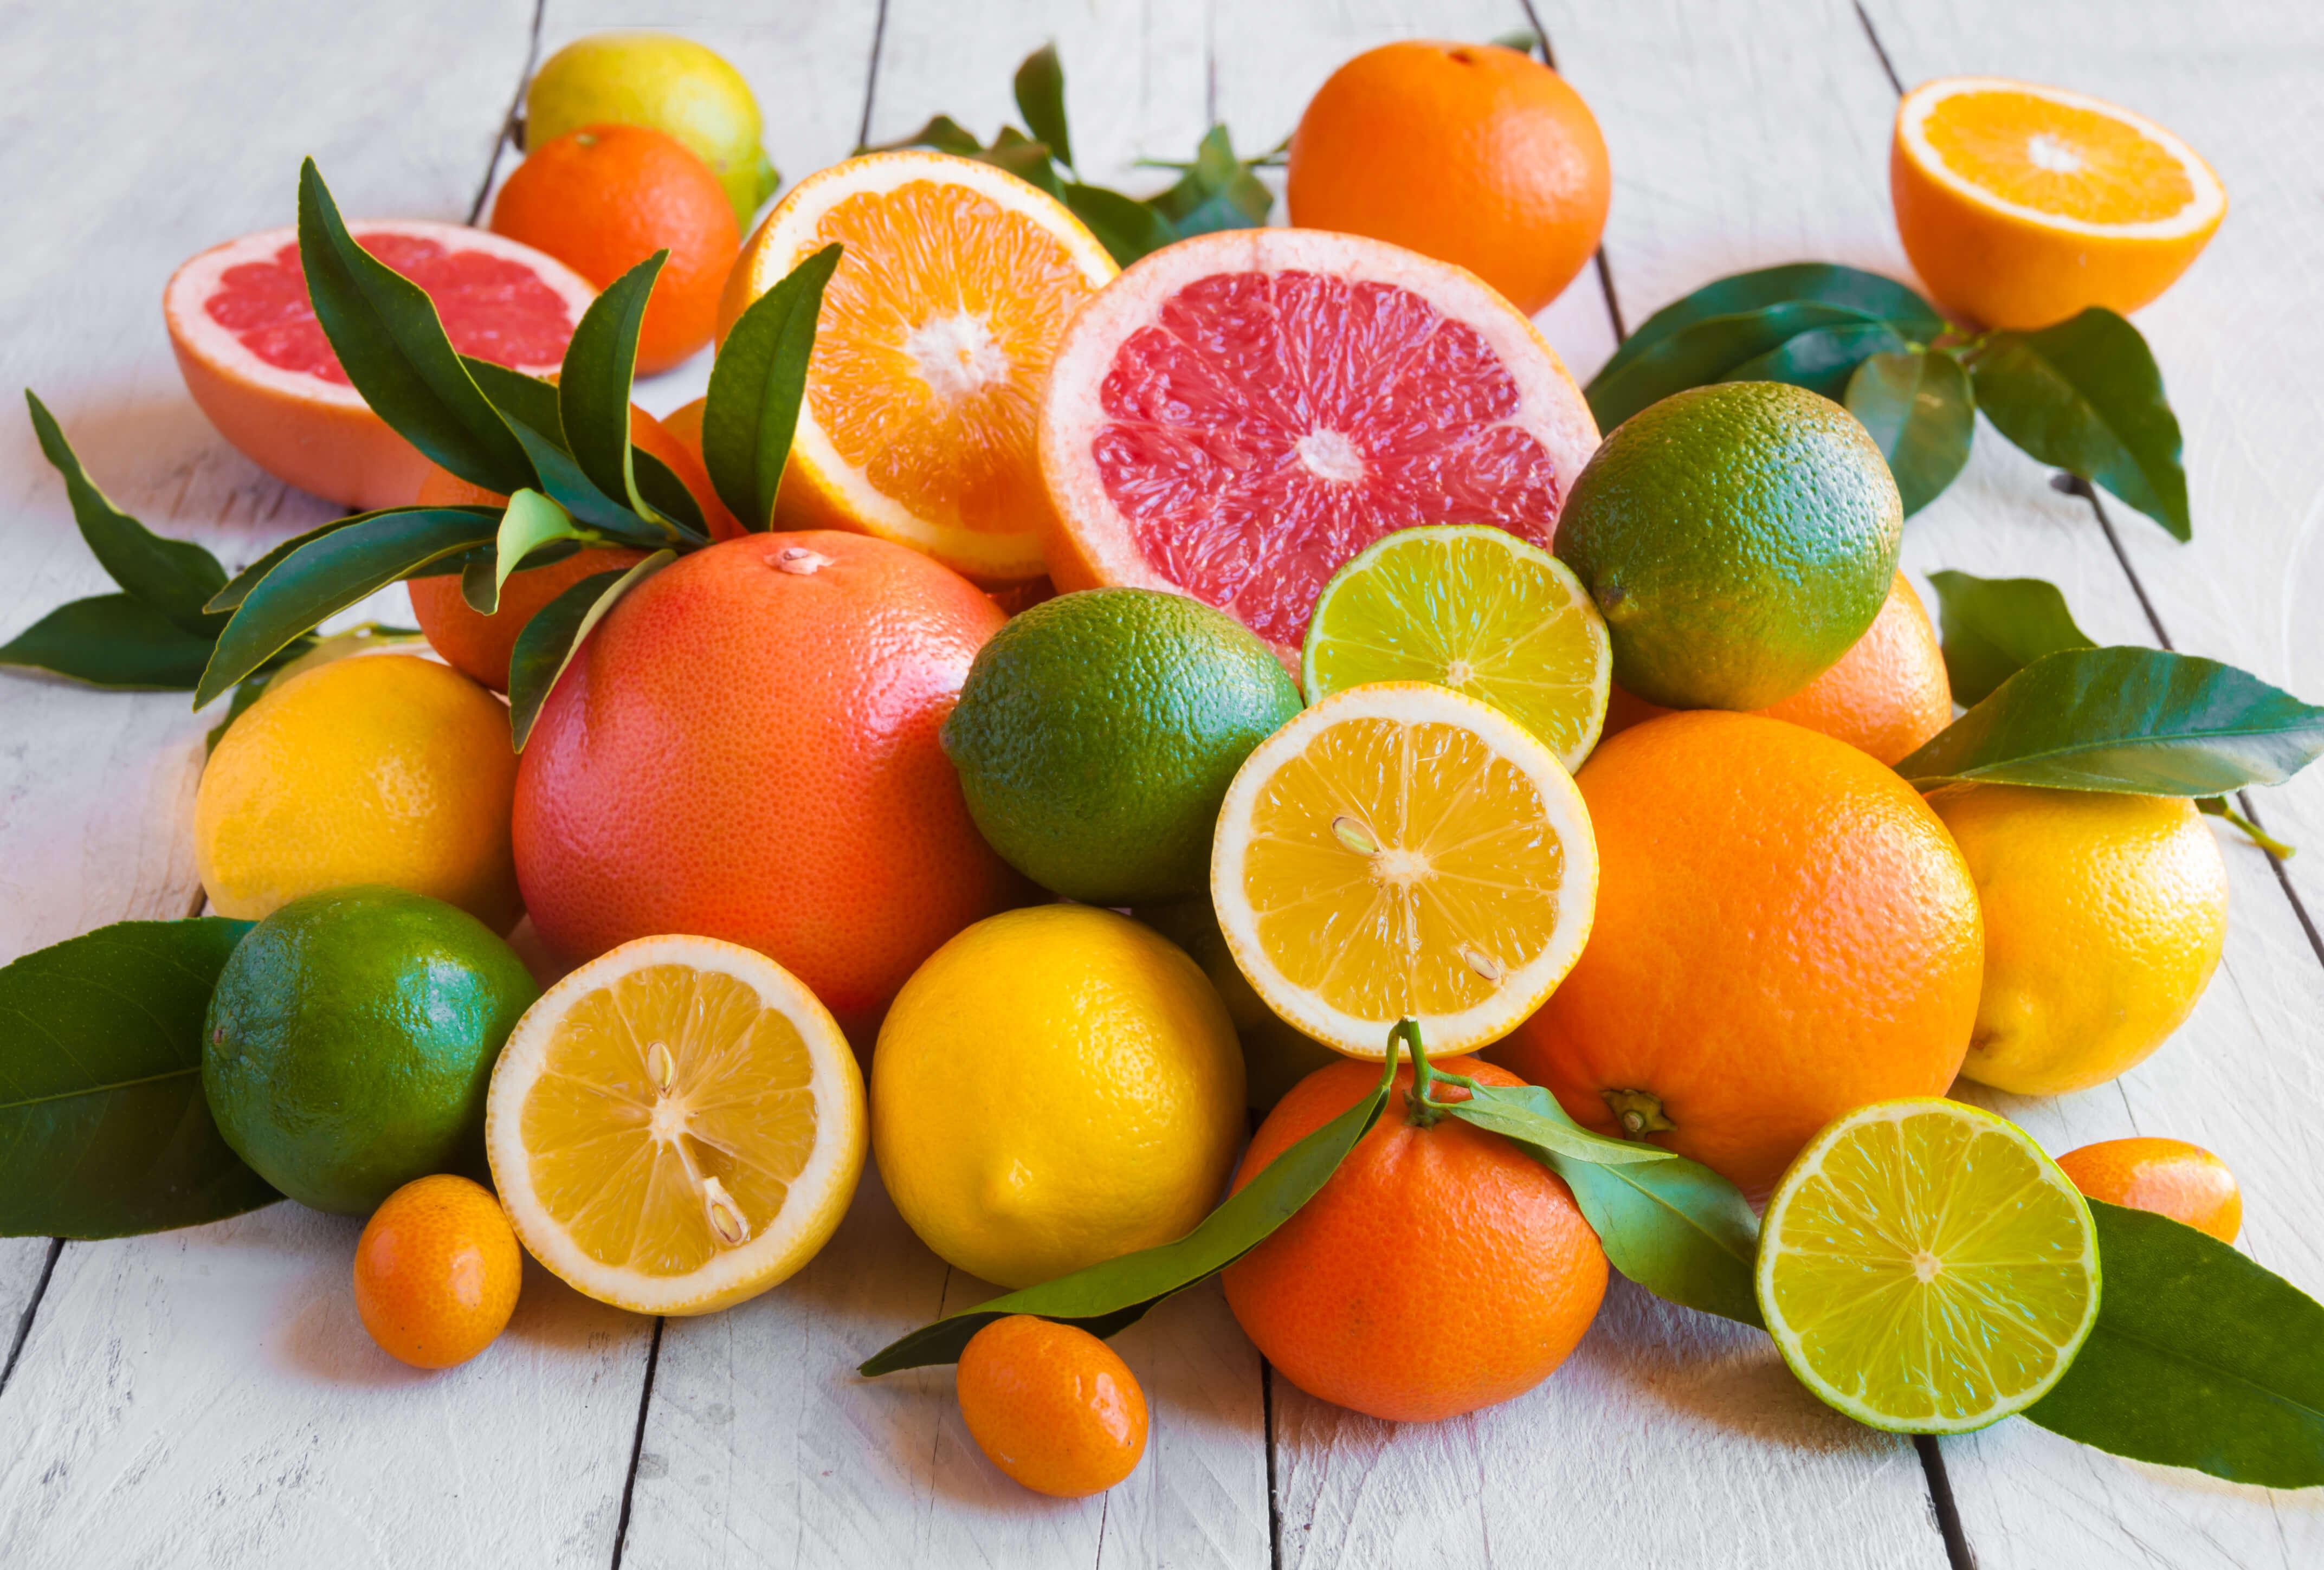 Some Essential Oils Increase Risk of Sunburn